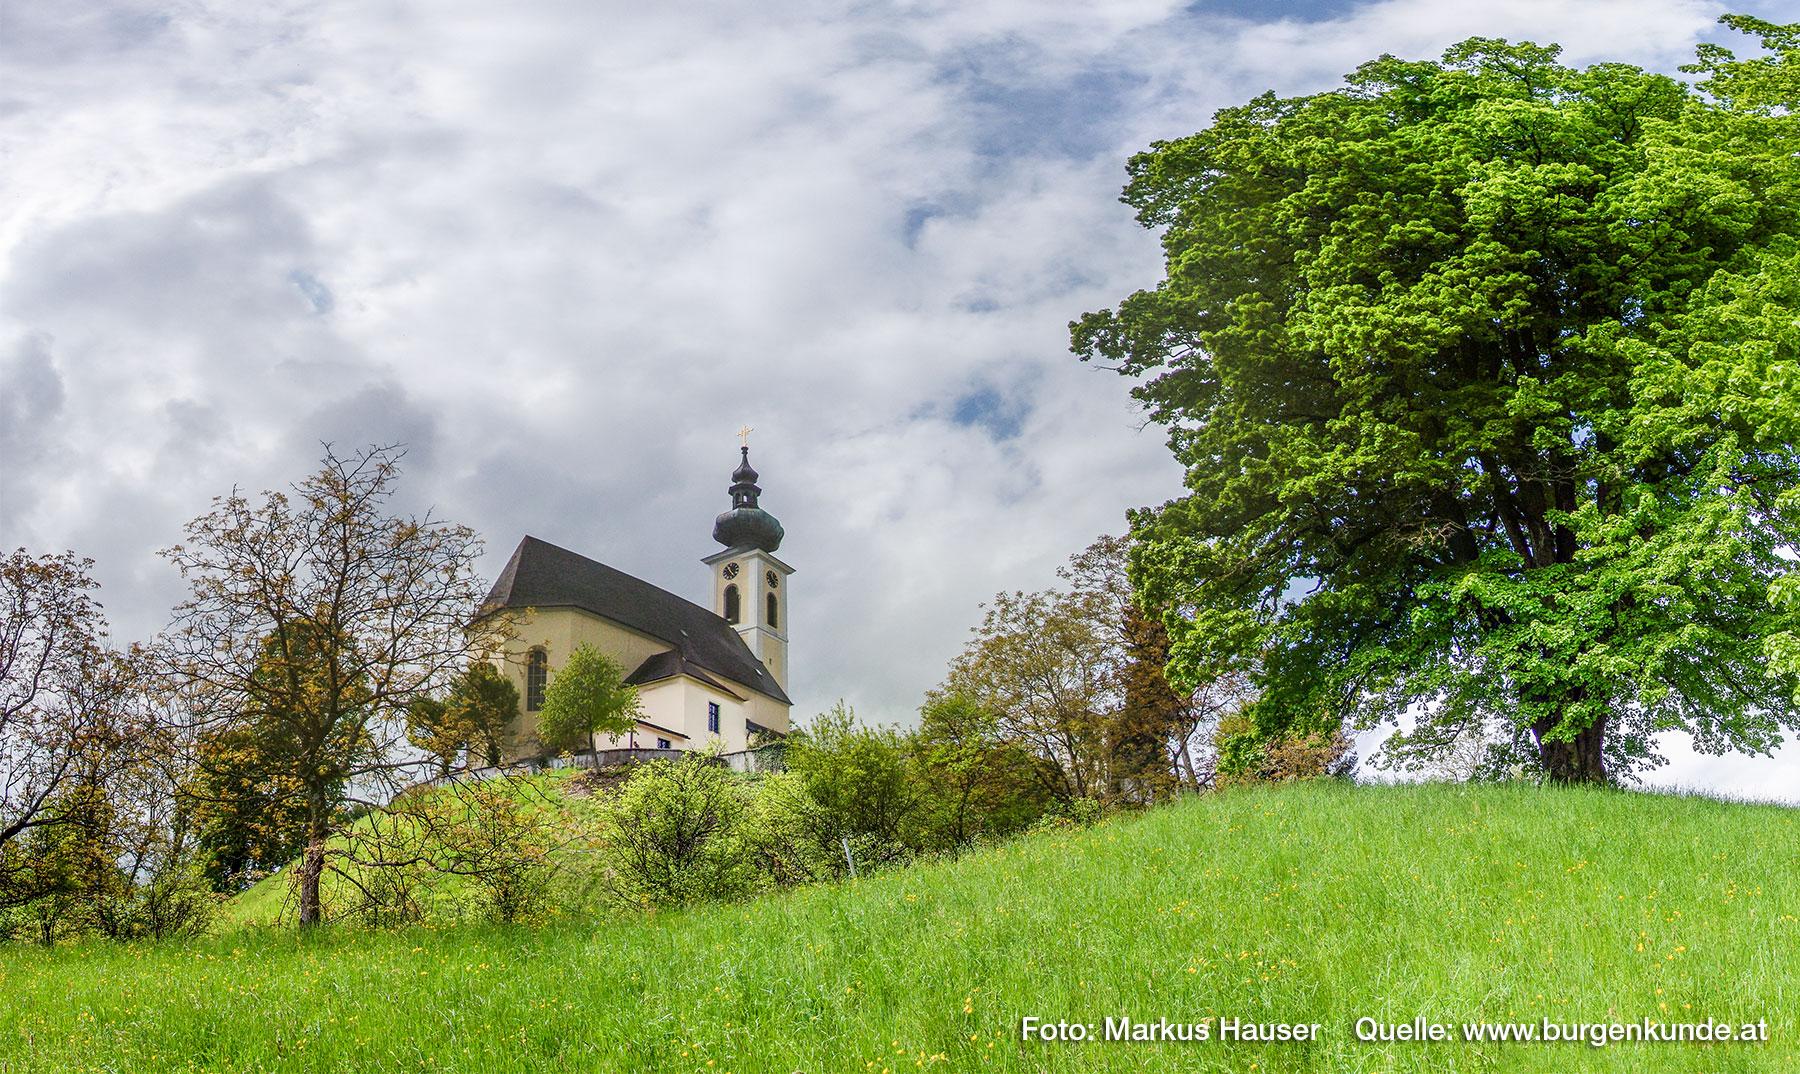 Blick zur Kirche Maria Himmelfahrt auf dem Plateau des Kirchberges, rechts der vorgelagerte Wall.